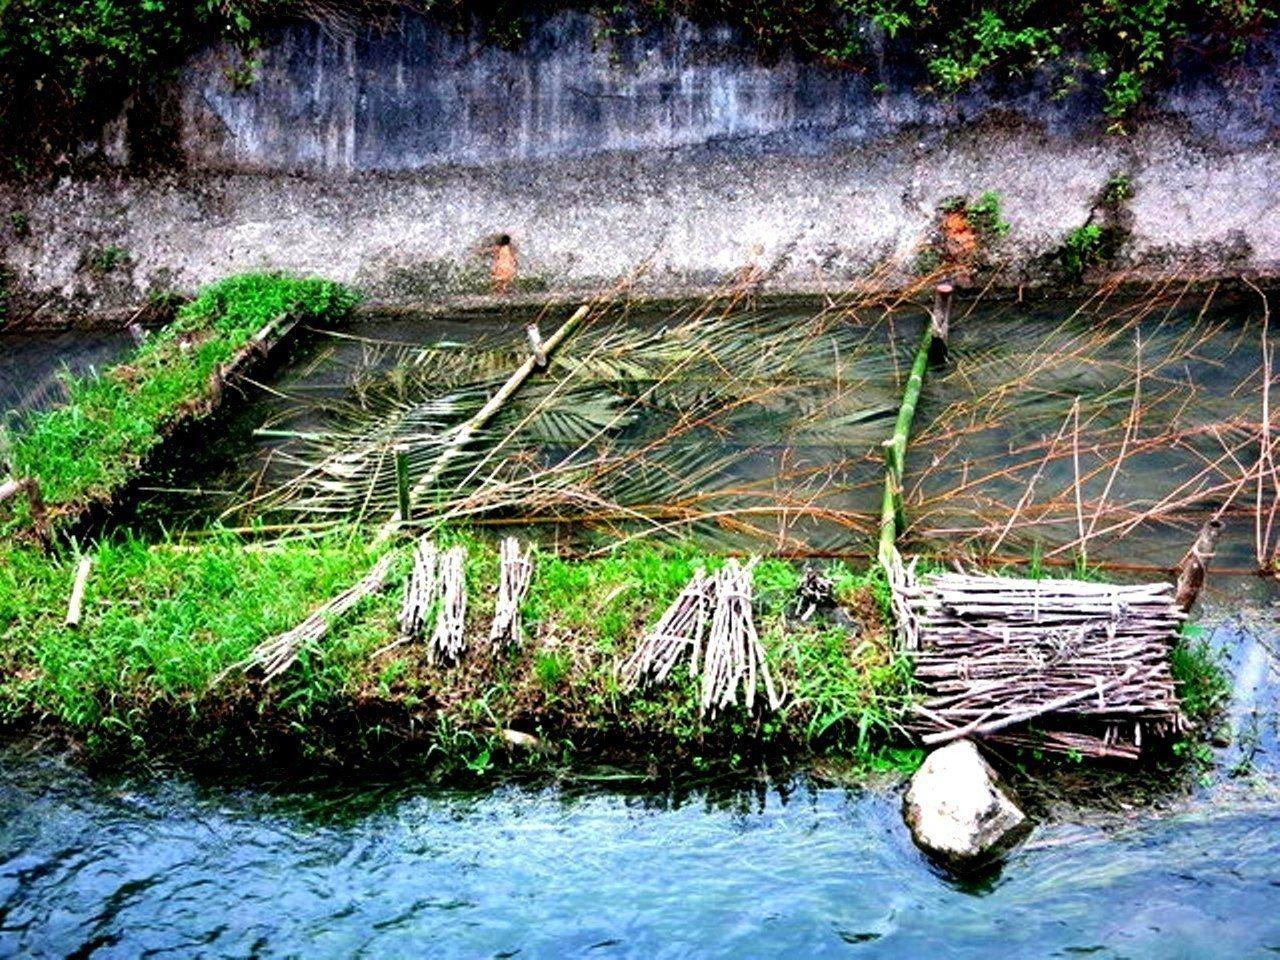 Palakaw─巴拉告傳統捕魚技藝工法。 圖/台中市原民會提供